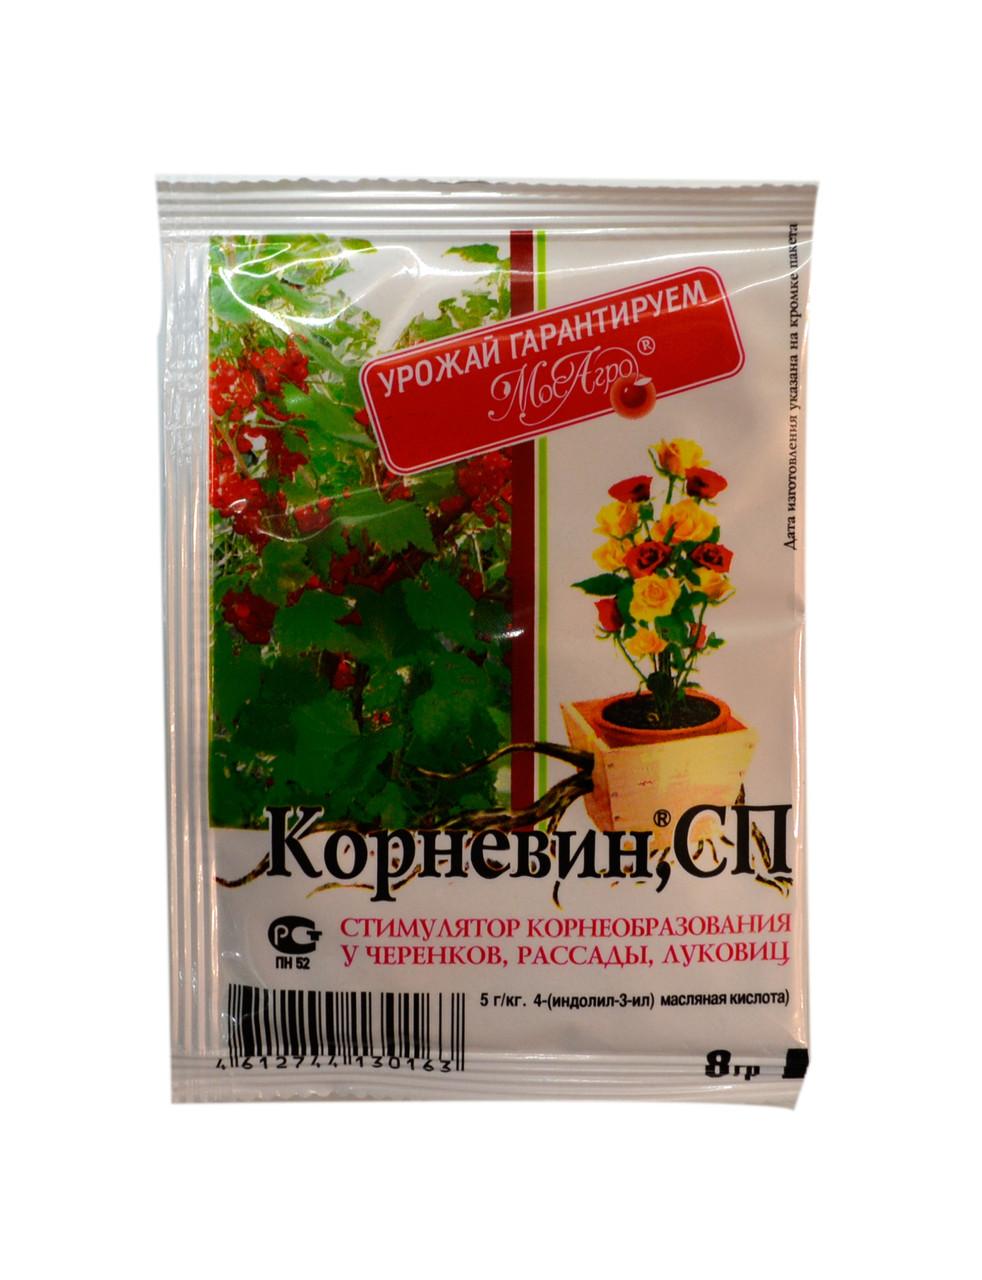 Корневин, стимулятор корнеобразования растений, 8г